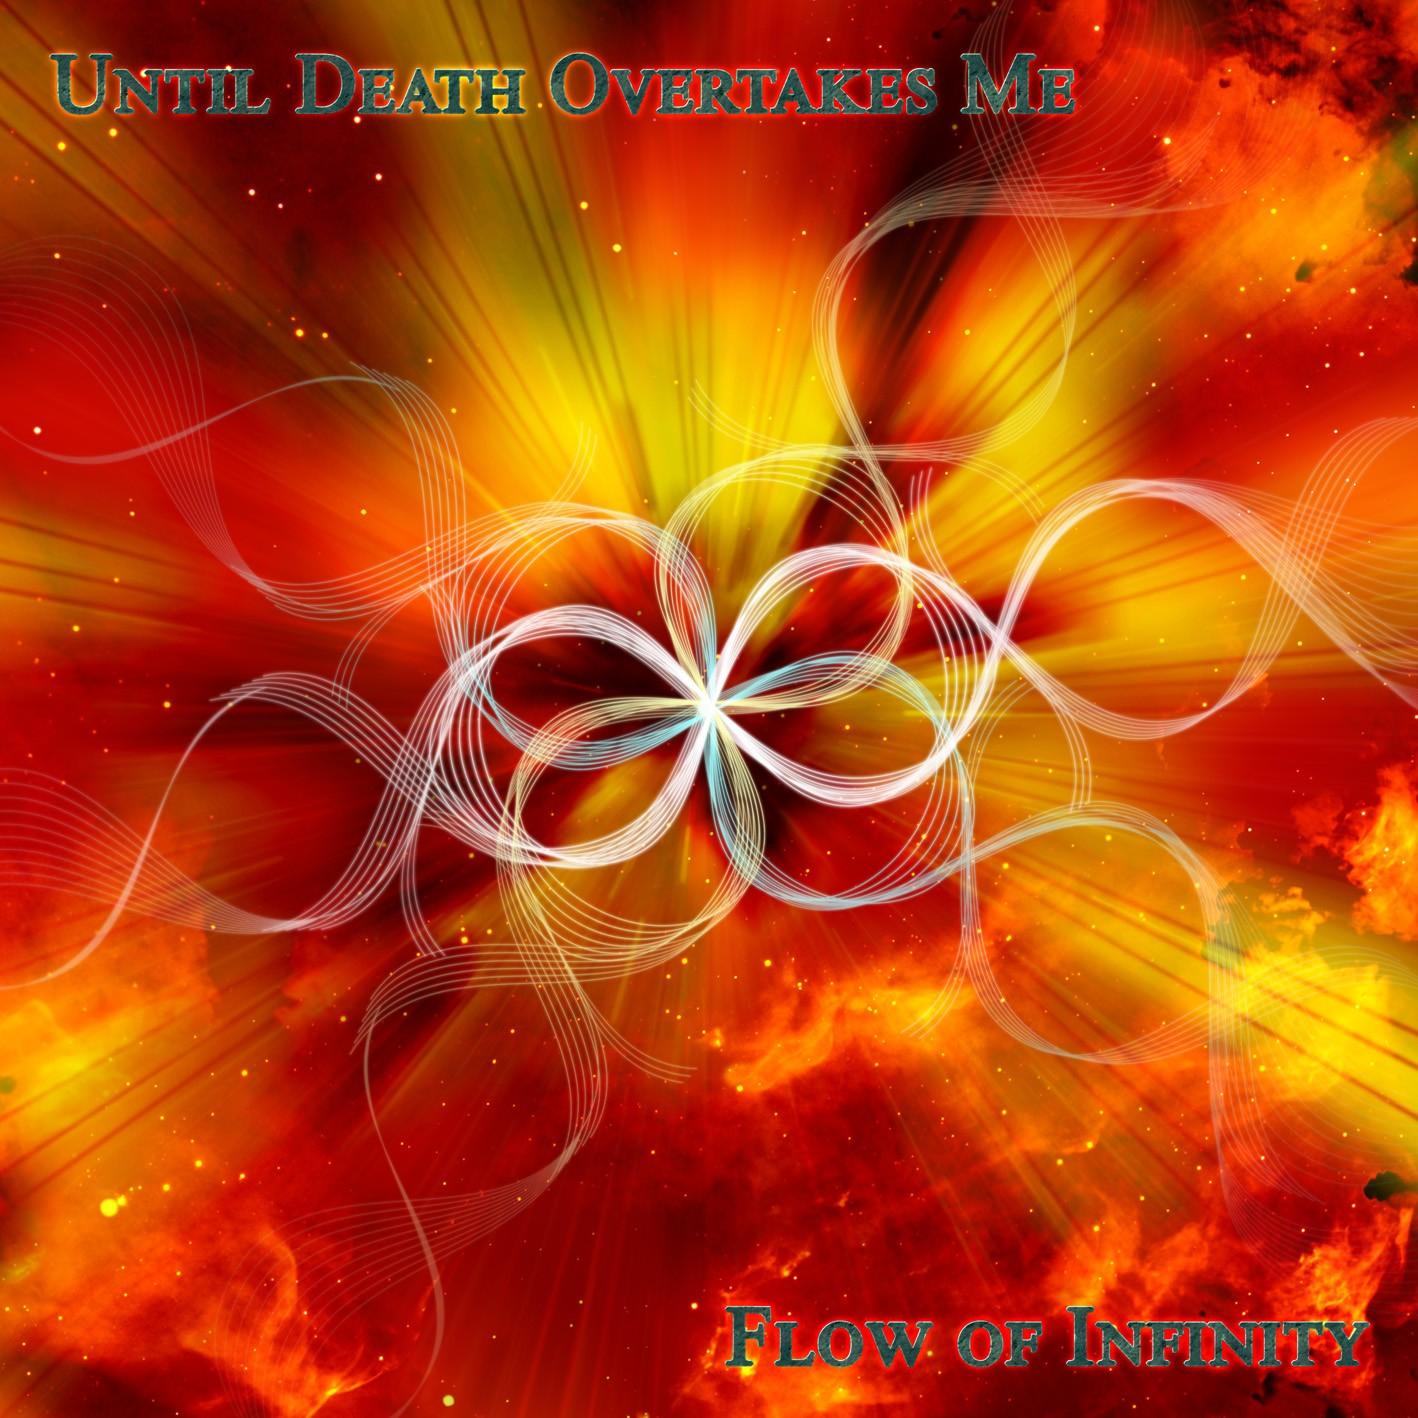 Until Death Overtakes Me - Interludium I: Funeral Path